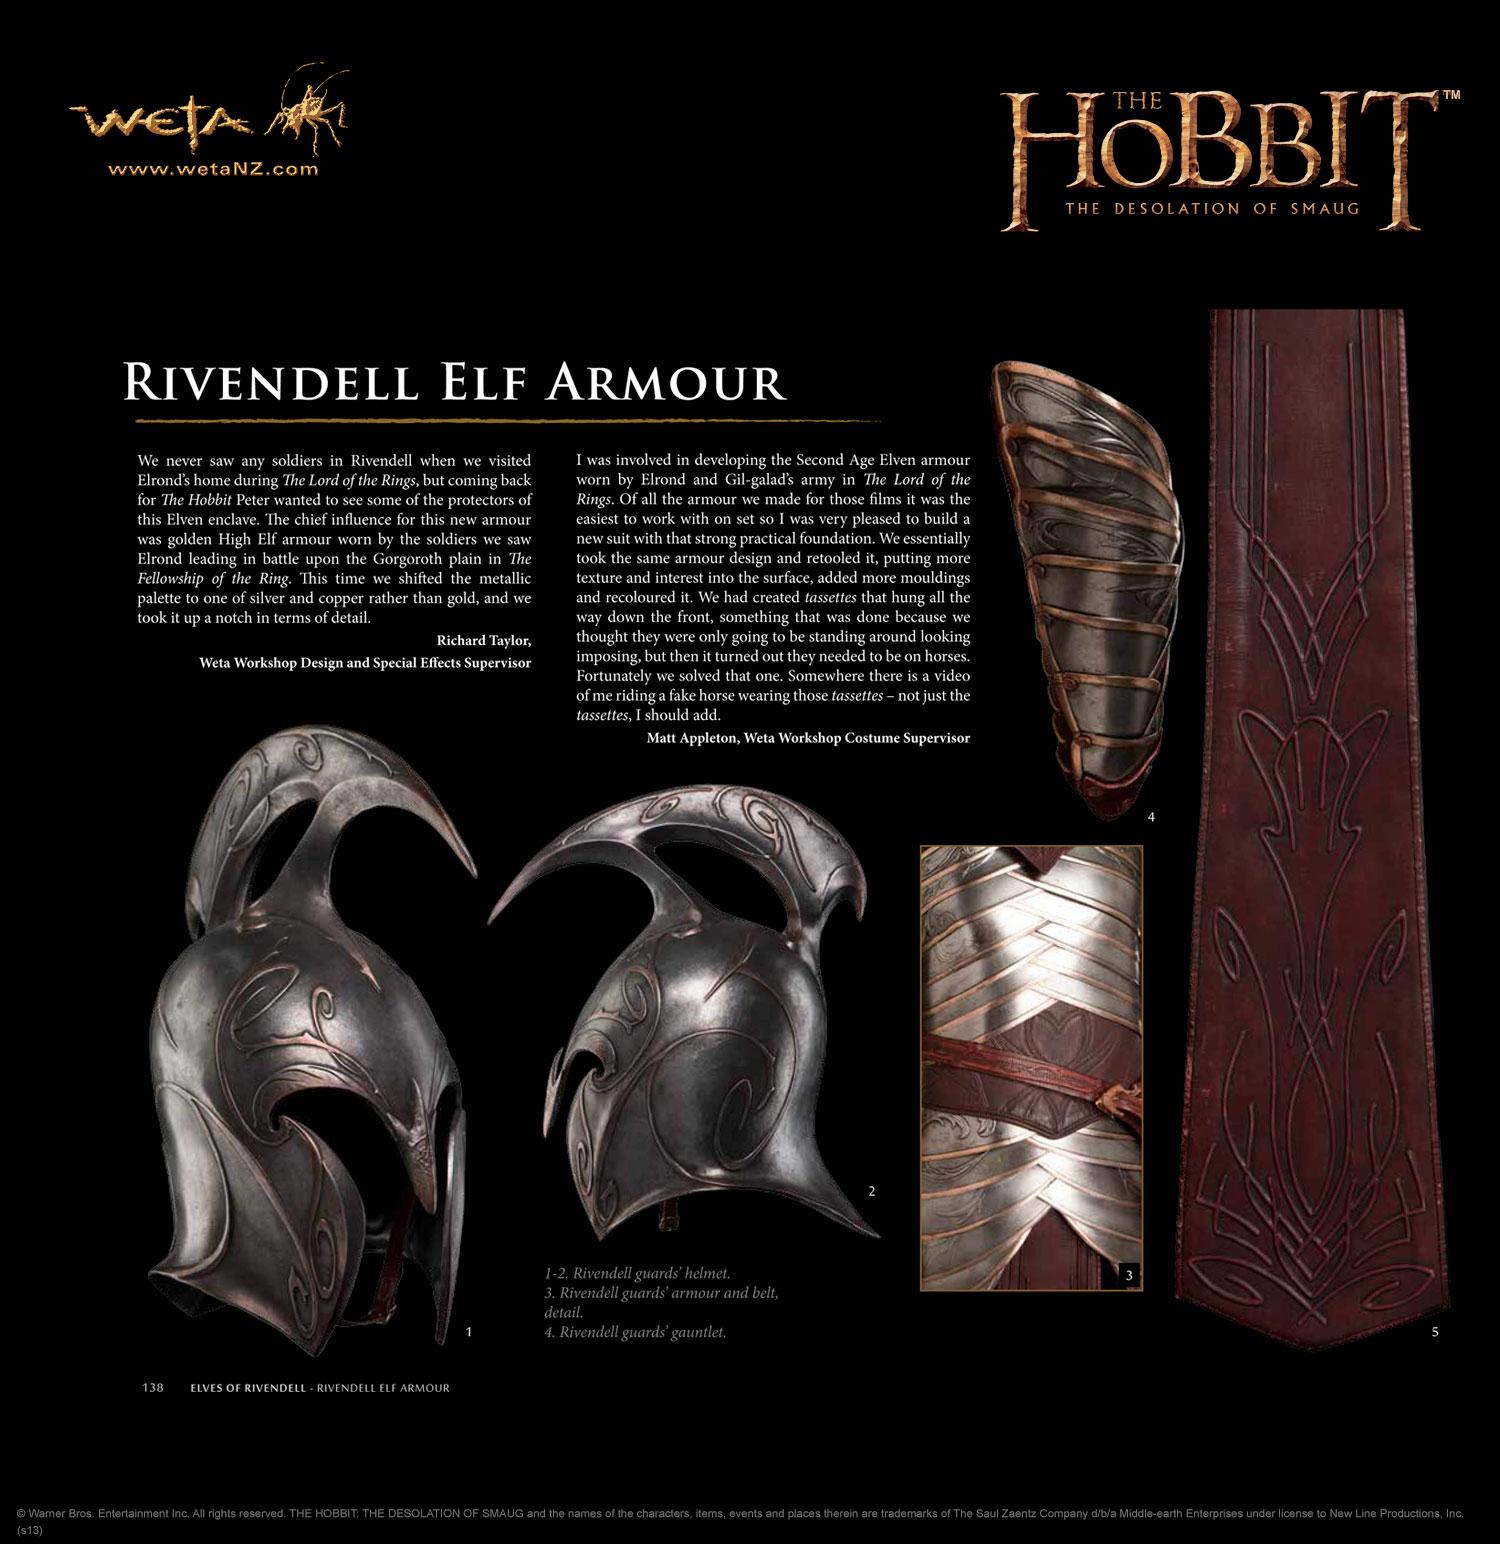 hobbit-chroniclesDoSCloaksDaggersd2